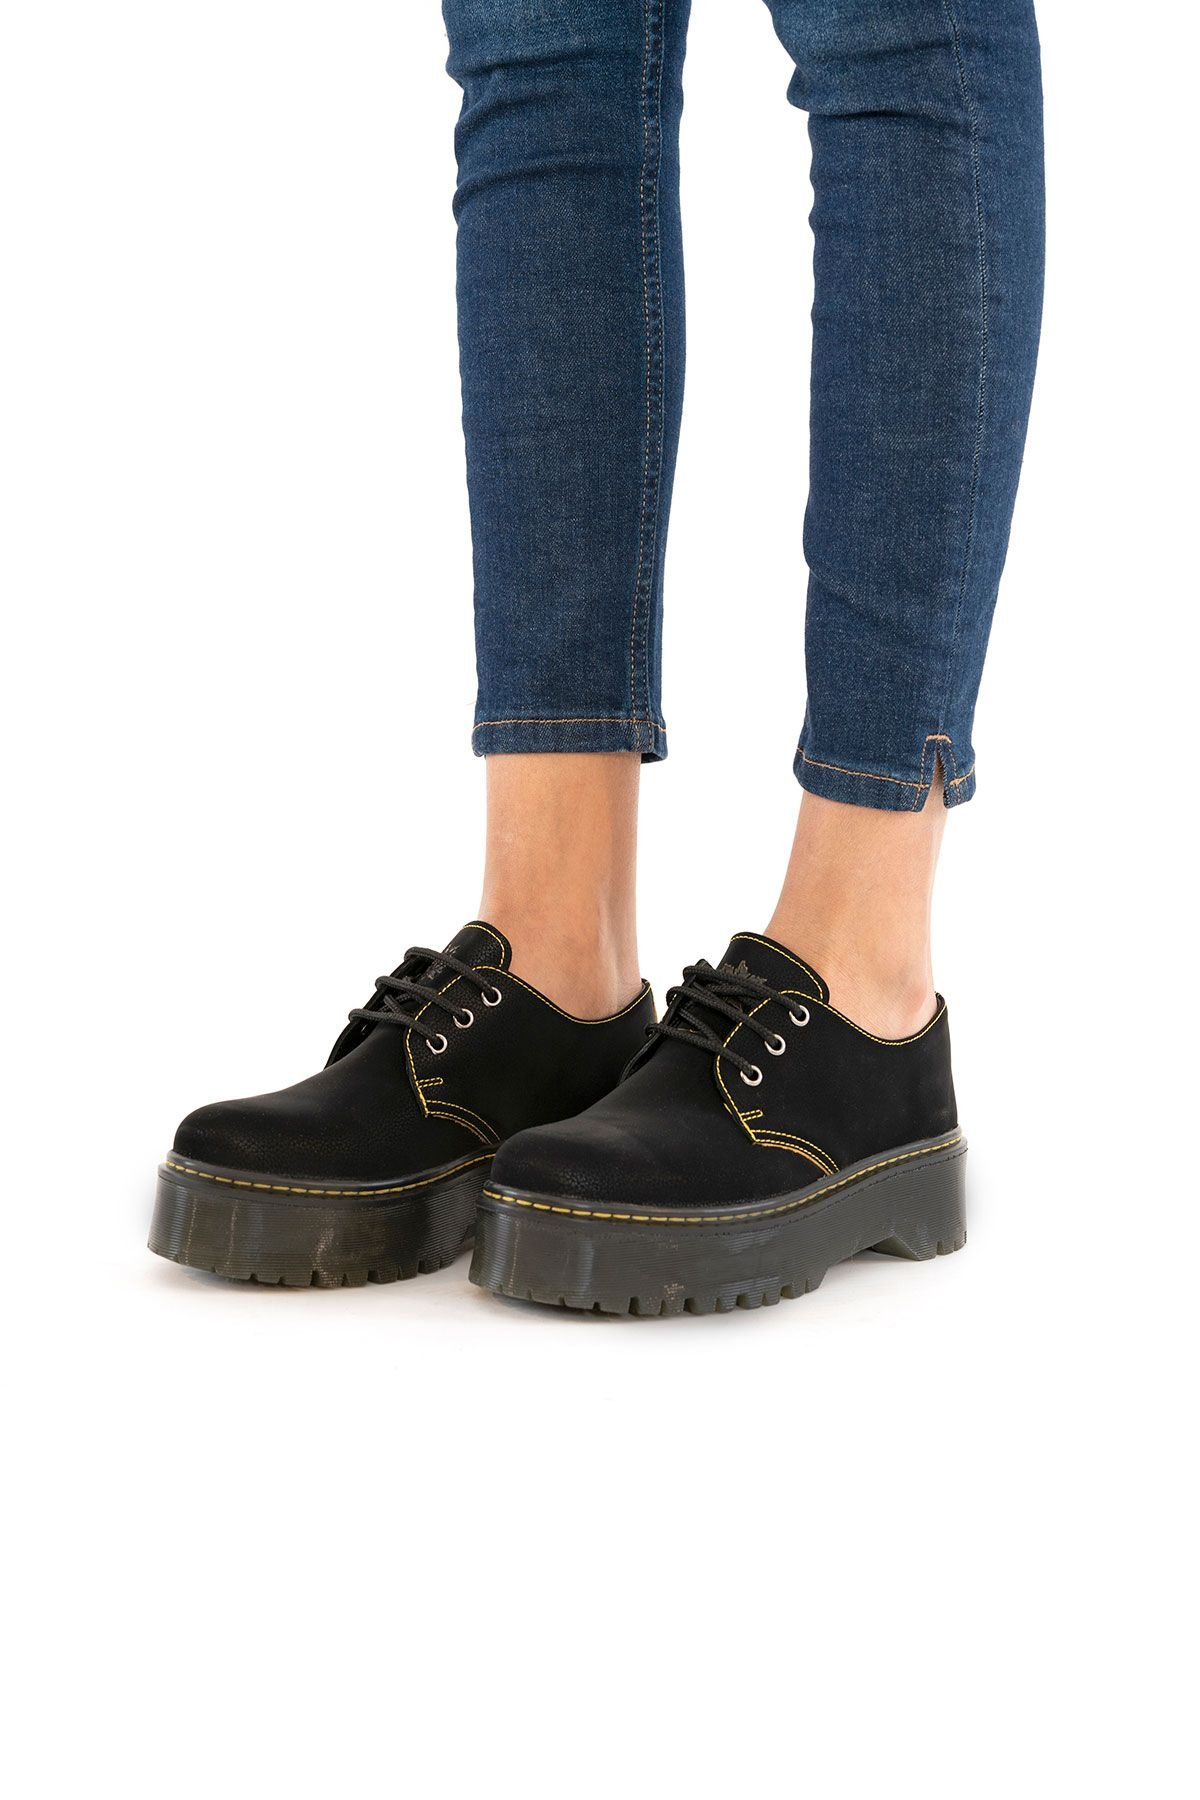 Pegia Hakiki Nubuk Kadın Ayakkabı 500702 Siyah